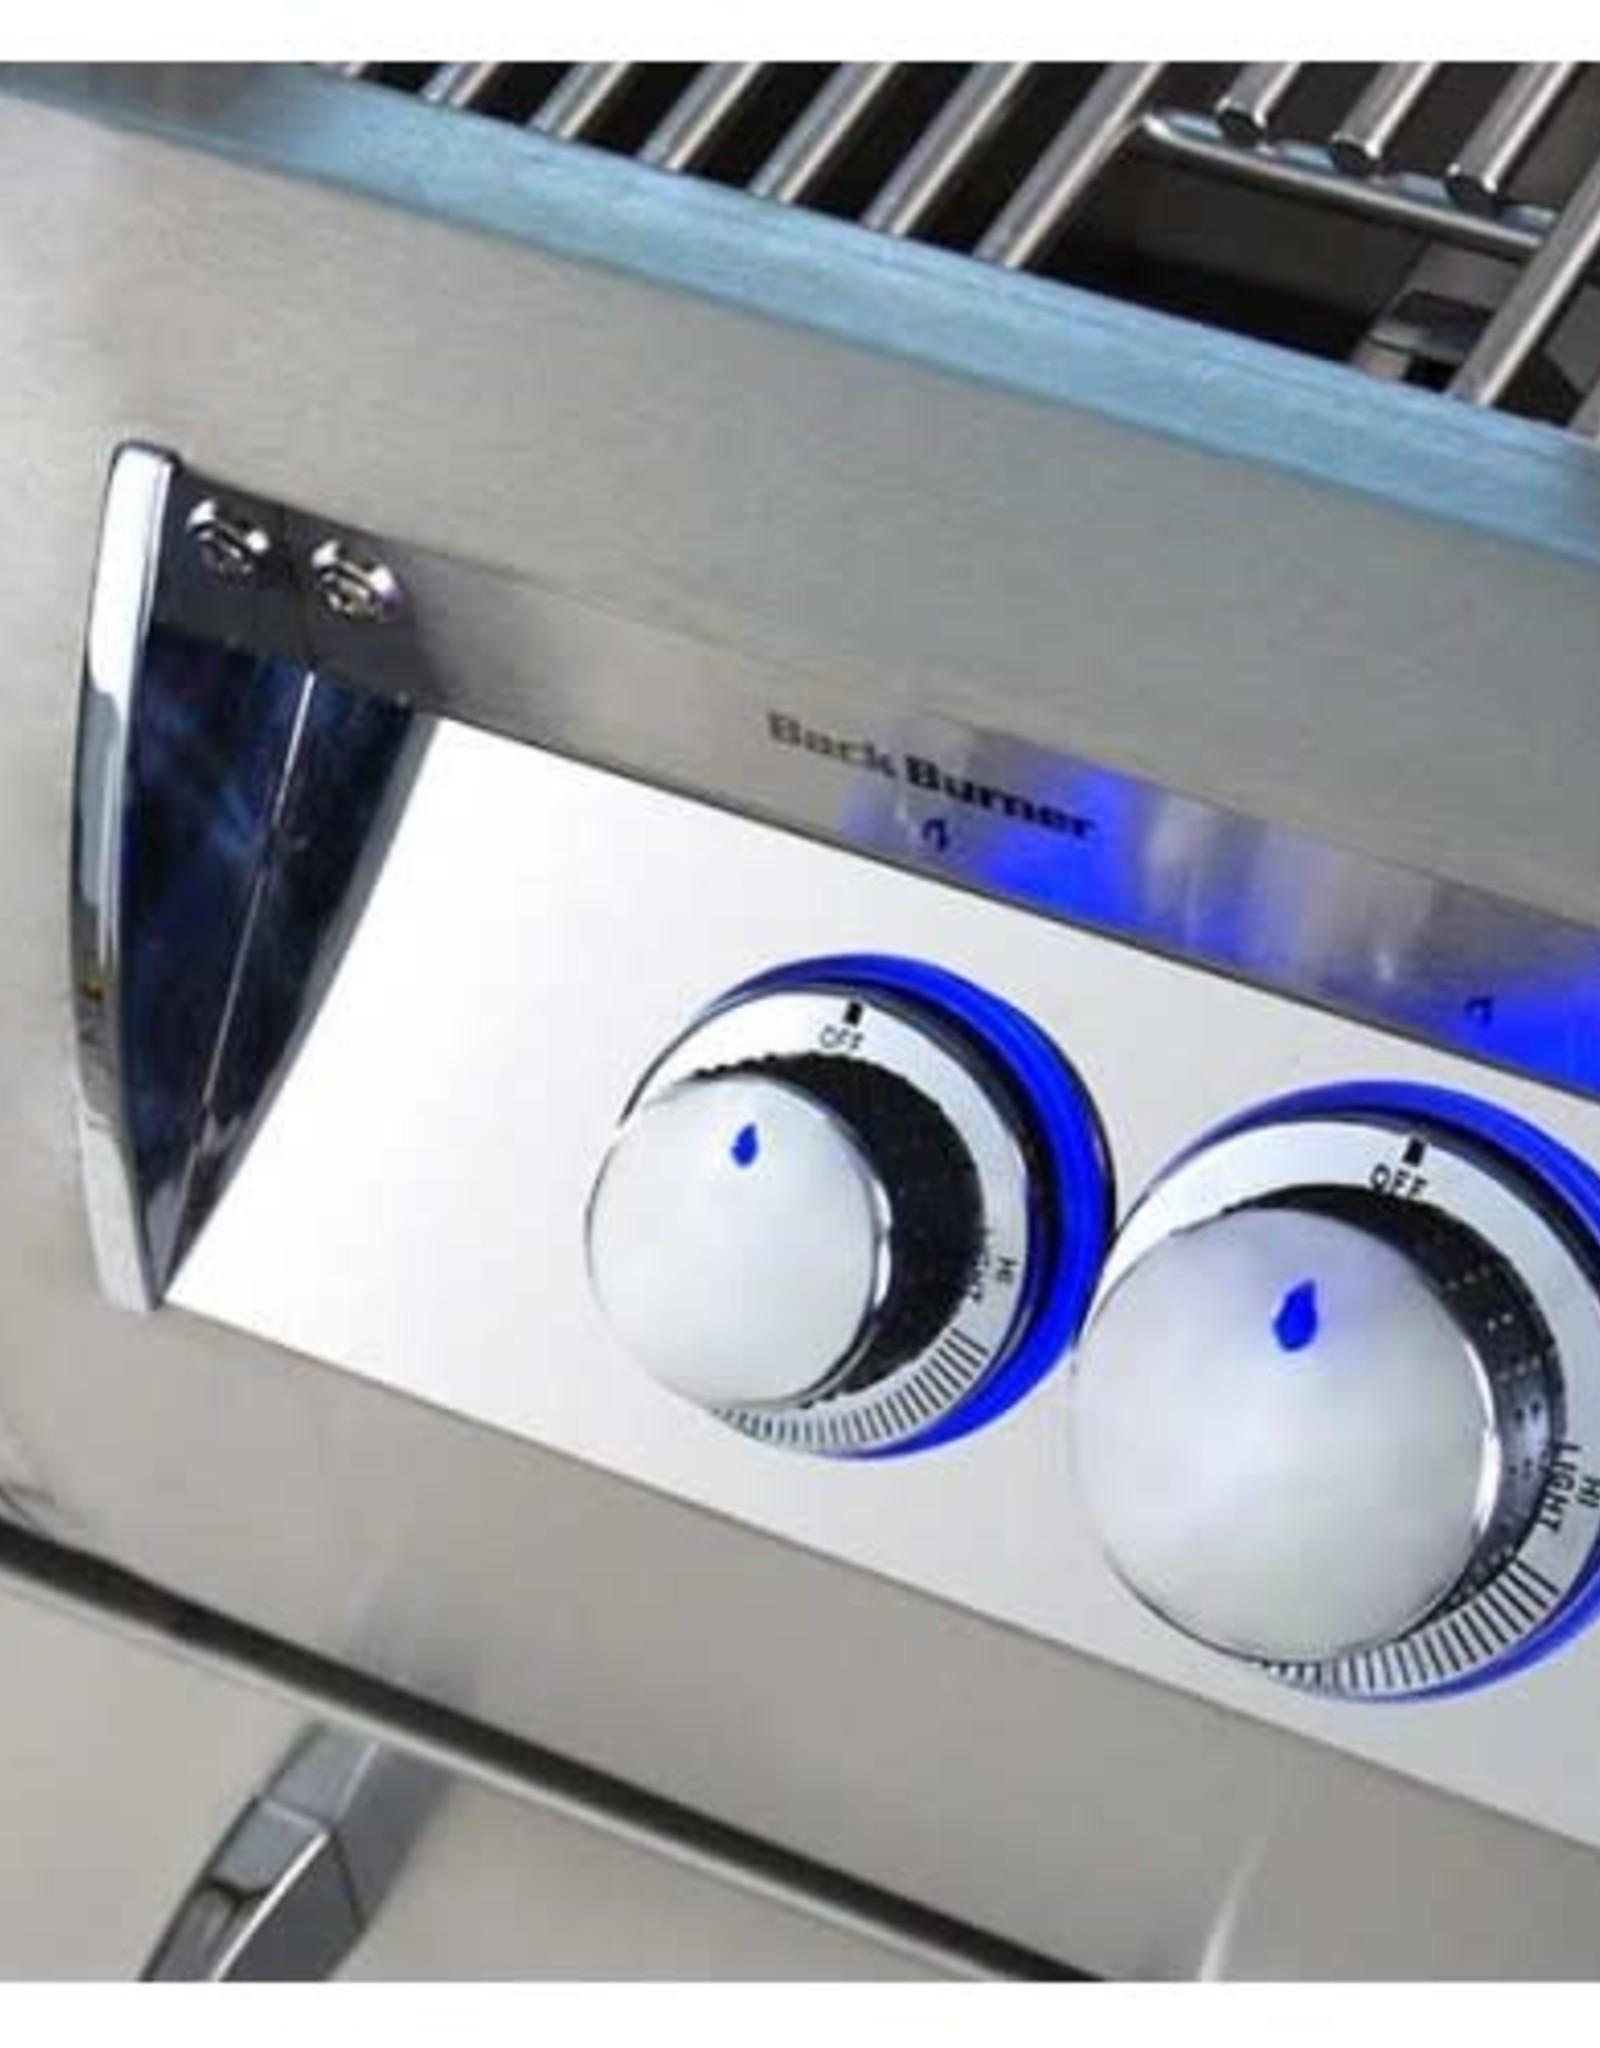 Fire Magic Fire Magic - Echelon Diamond E660s 30-inch Portable Grill with Single Side Burner (Analog)